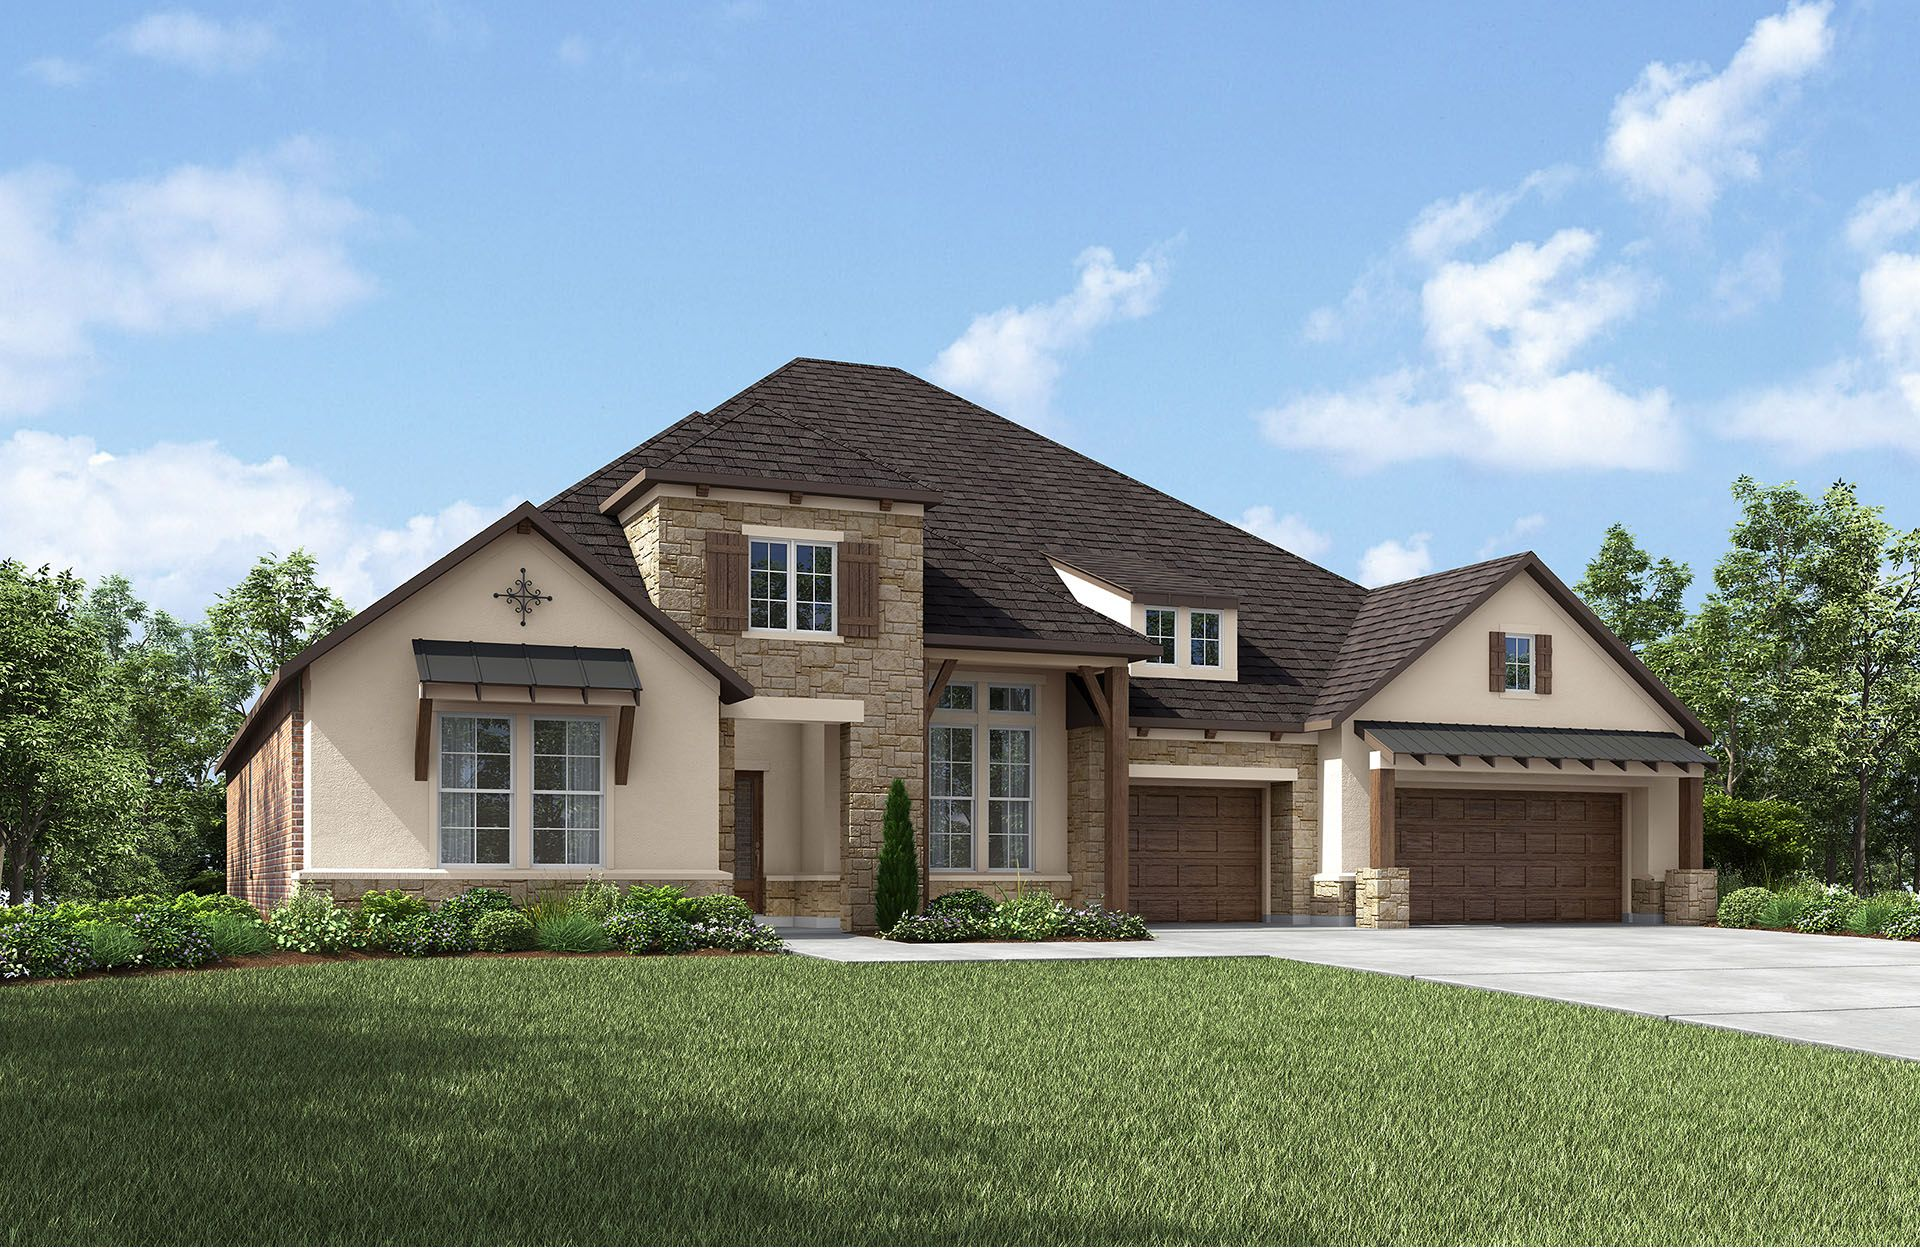 Single Family for Sale at Royal Brook At Kingwood - Castella 3306 Lockridge Harbor Lane Porter, Texas 77365 United States